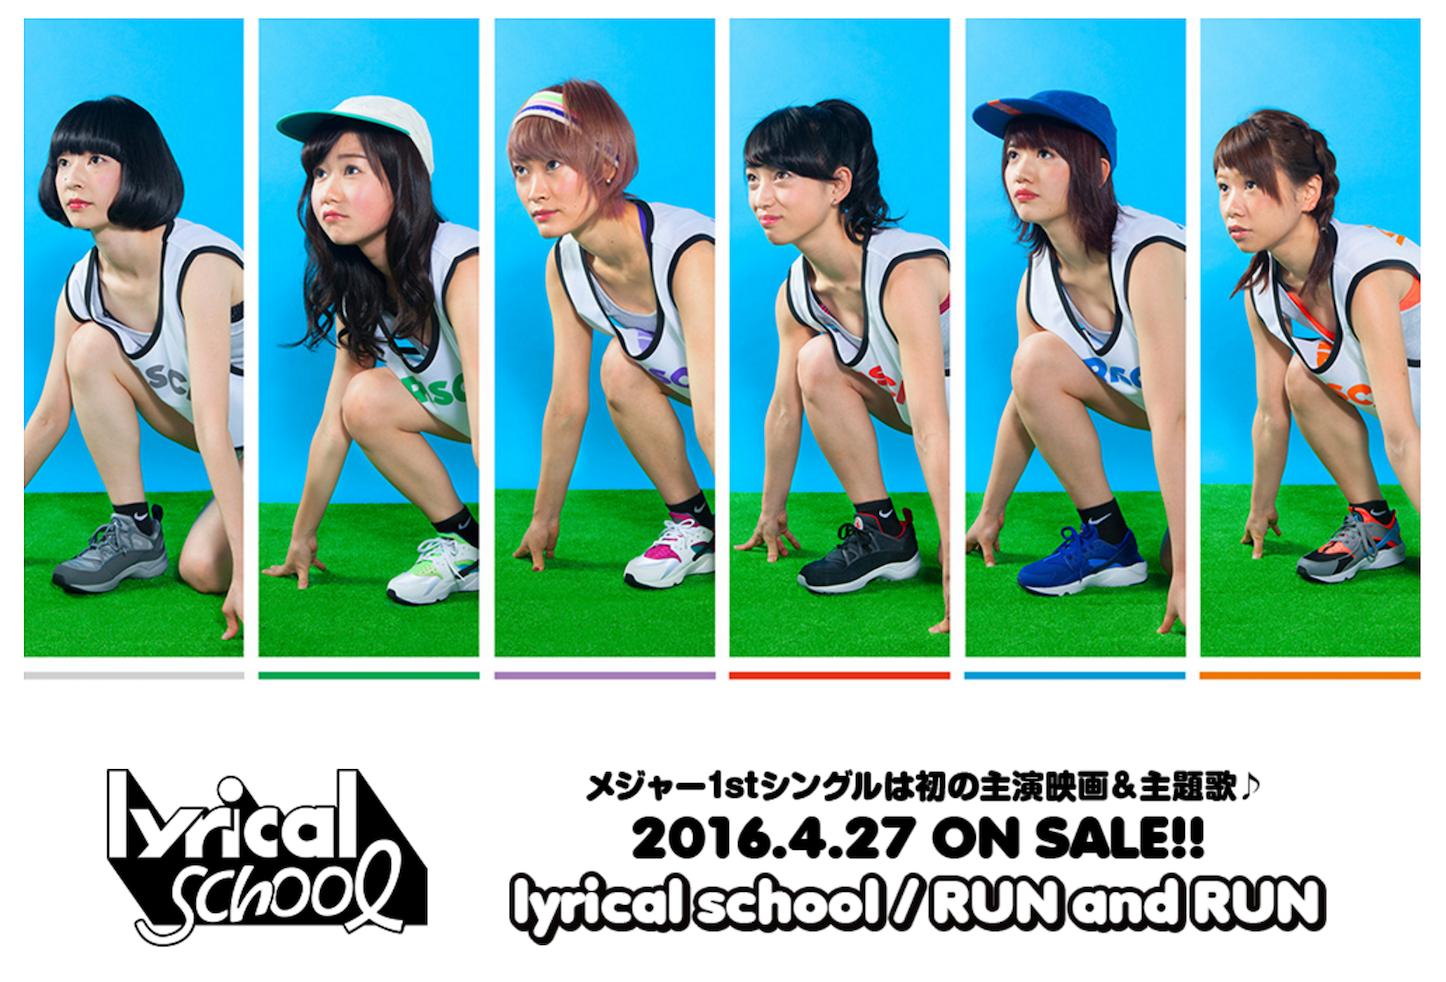 Lyrical school run and run